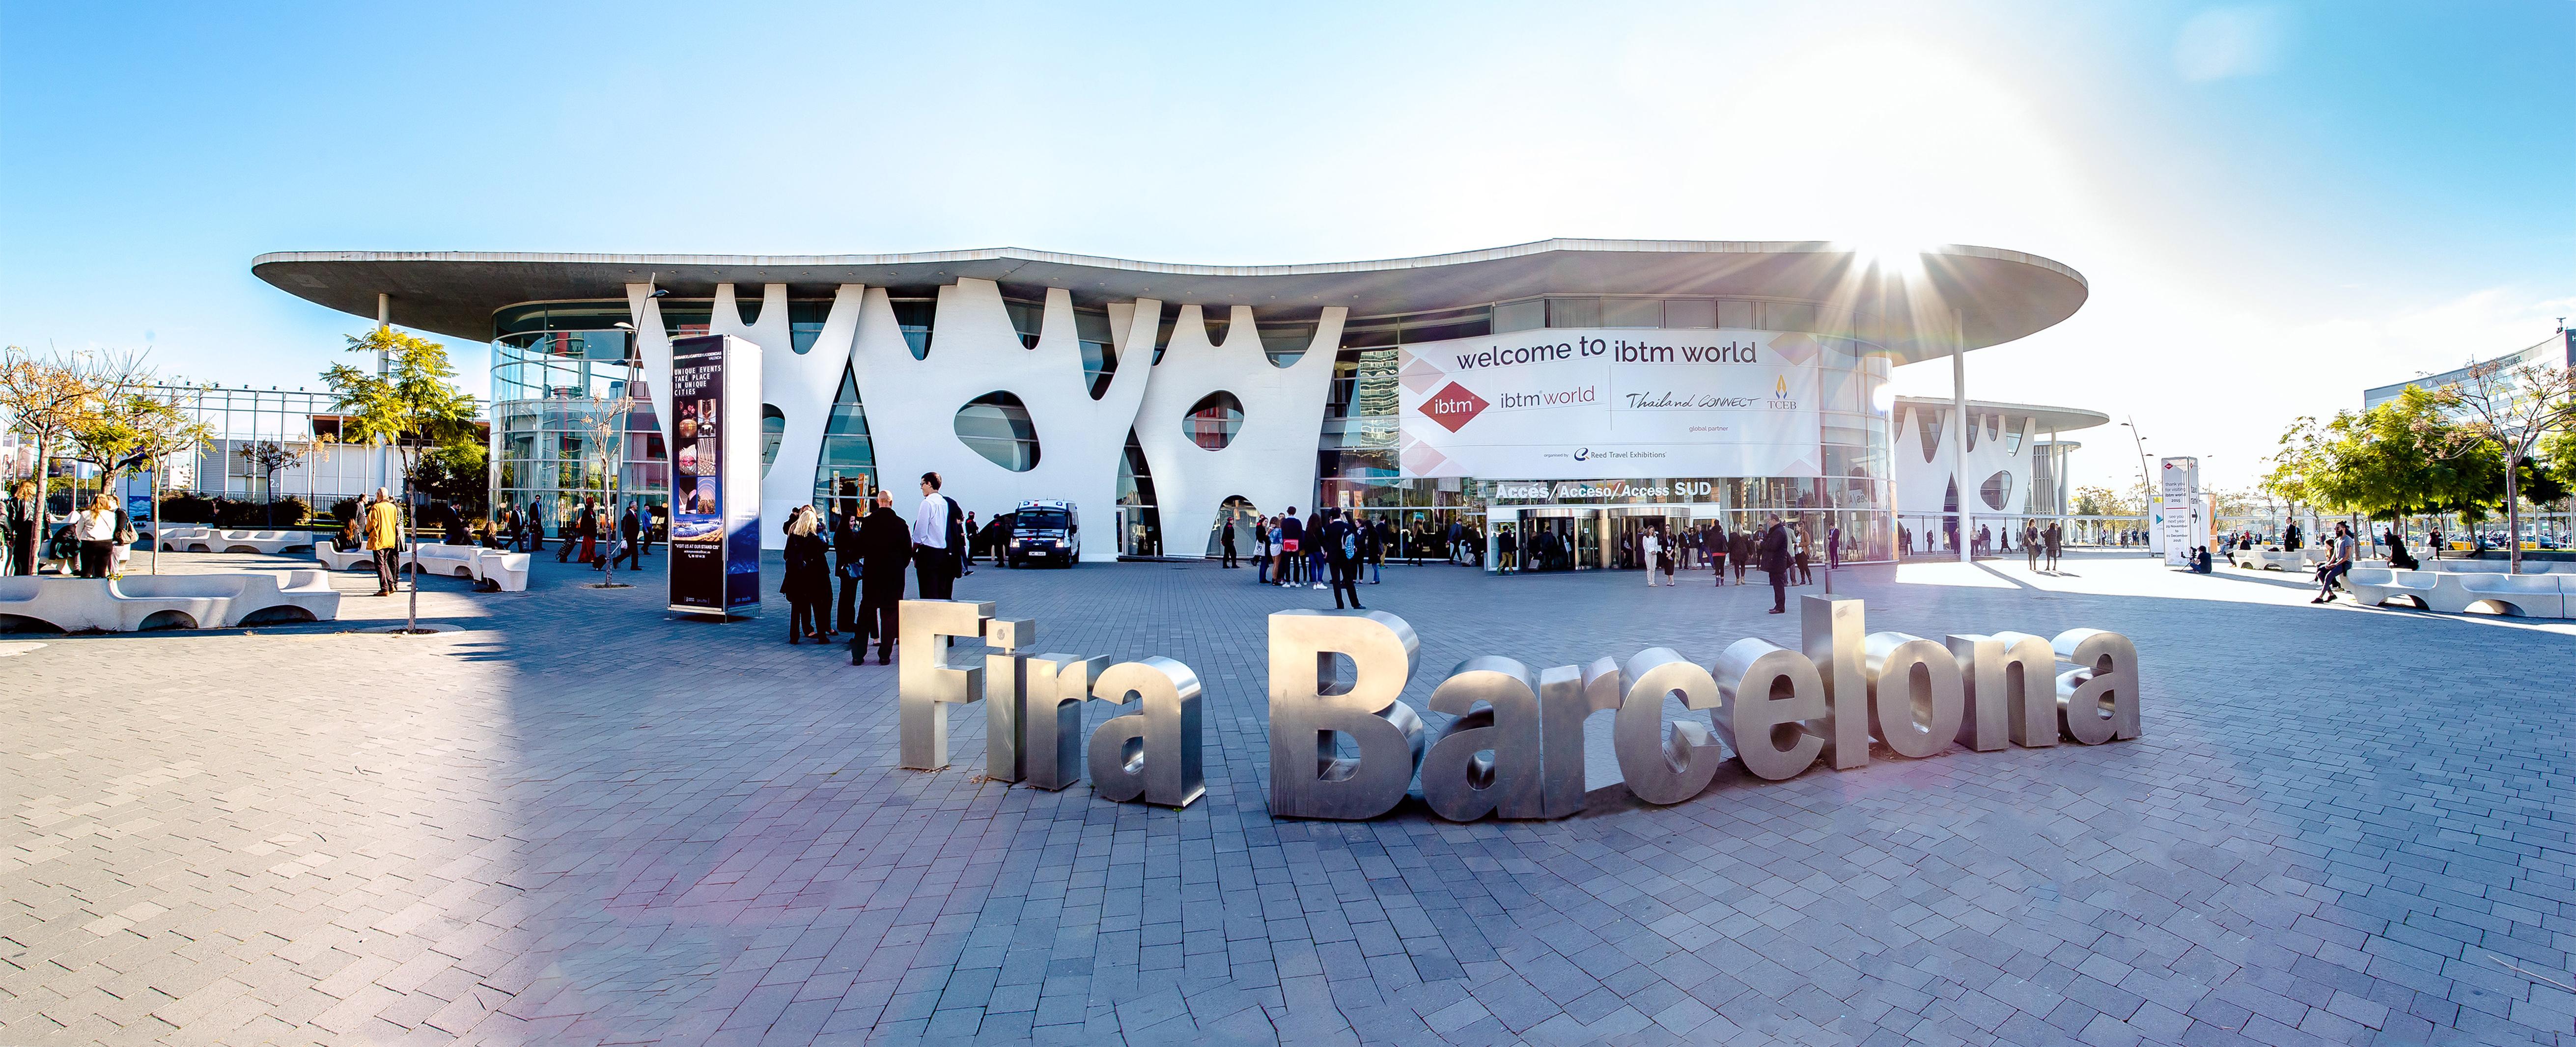 De passeig per l'IBTM World de Barcelona